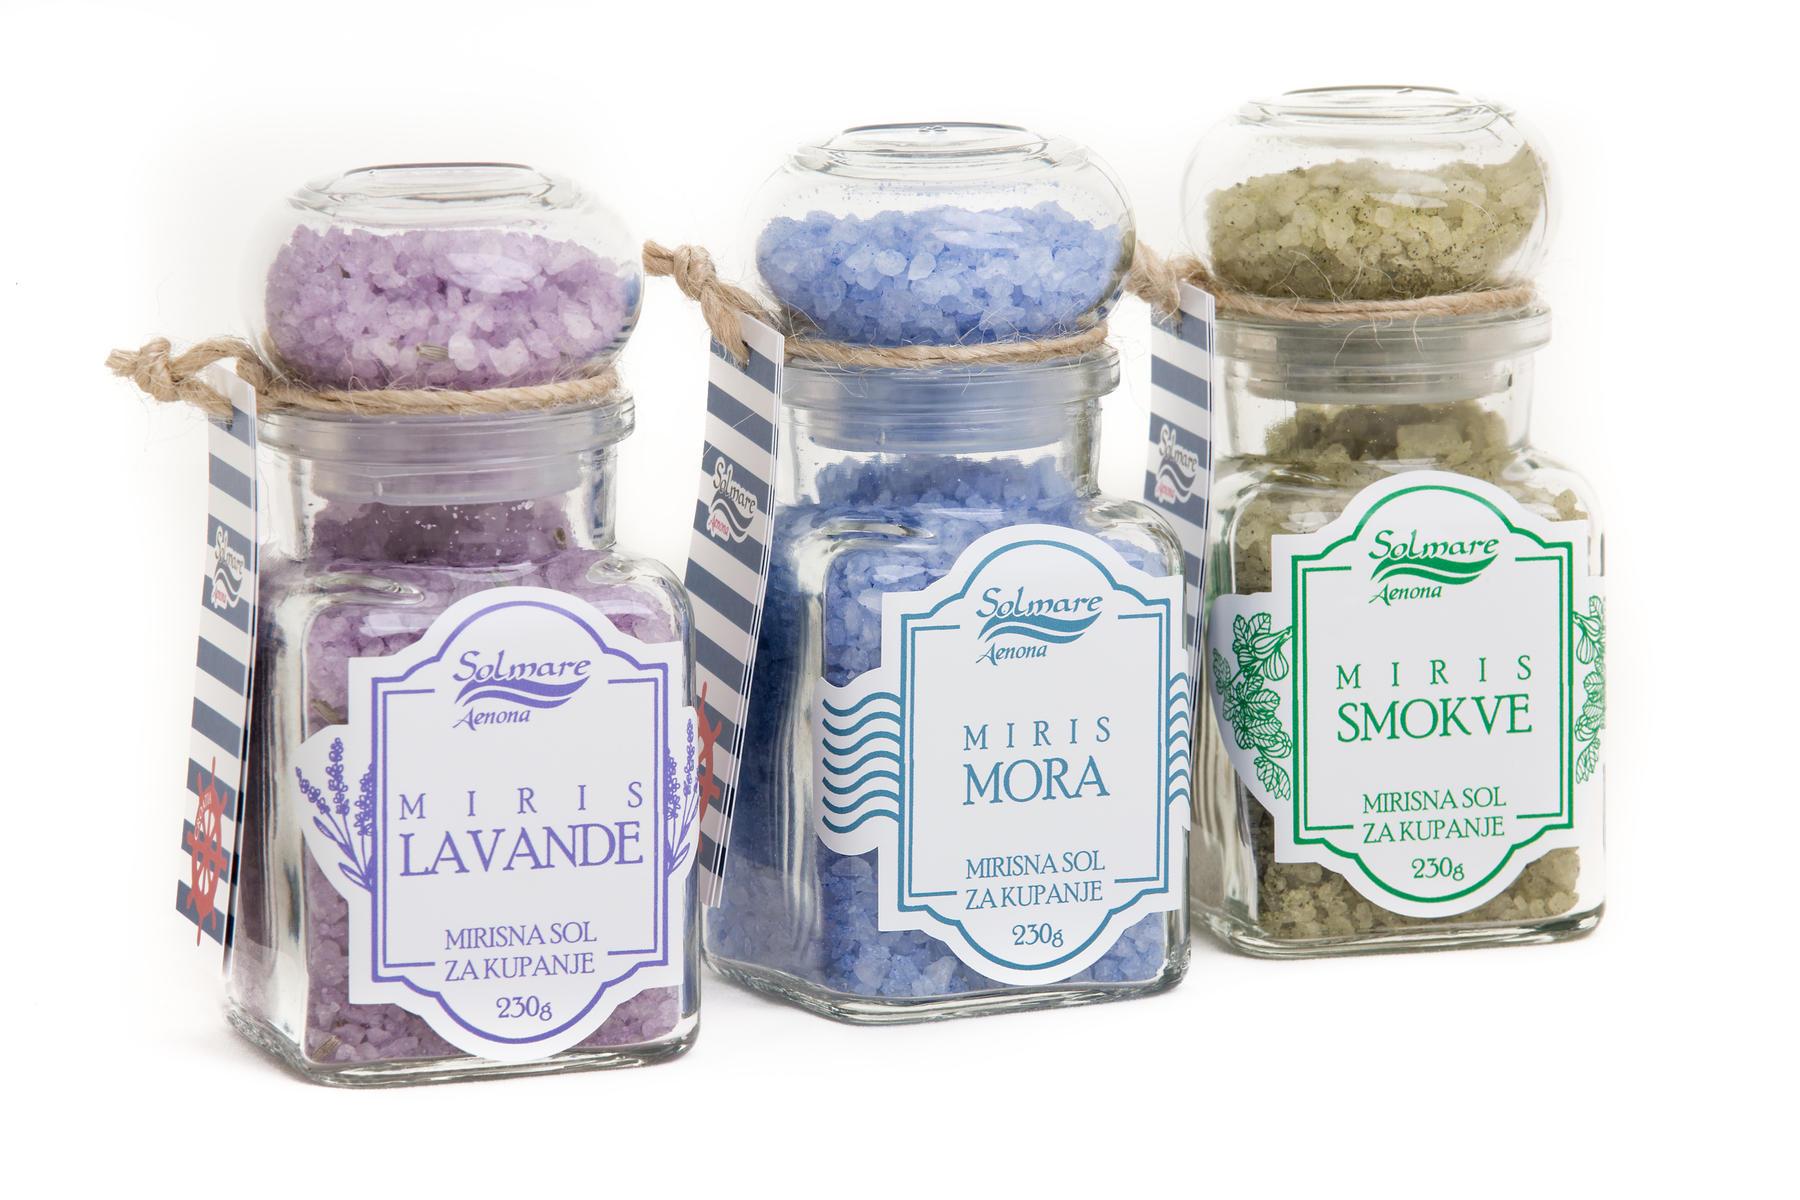 Solmare Aenona - mirisna sol za kupanje